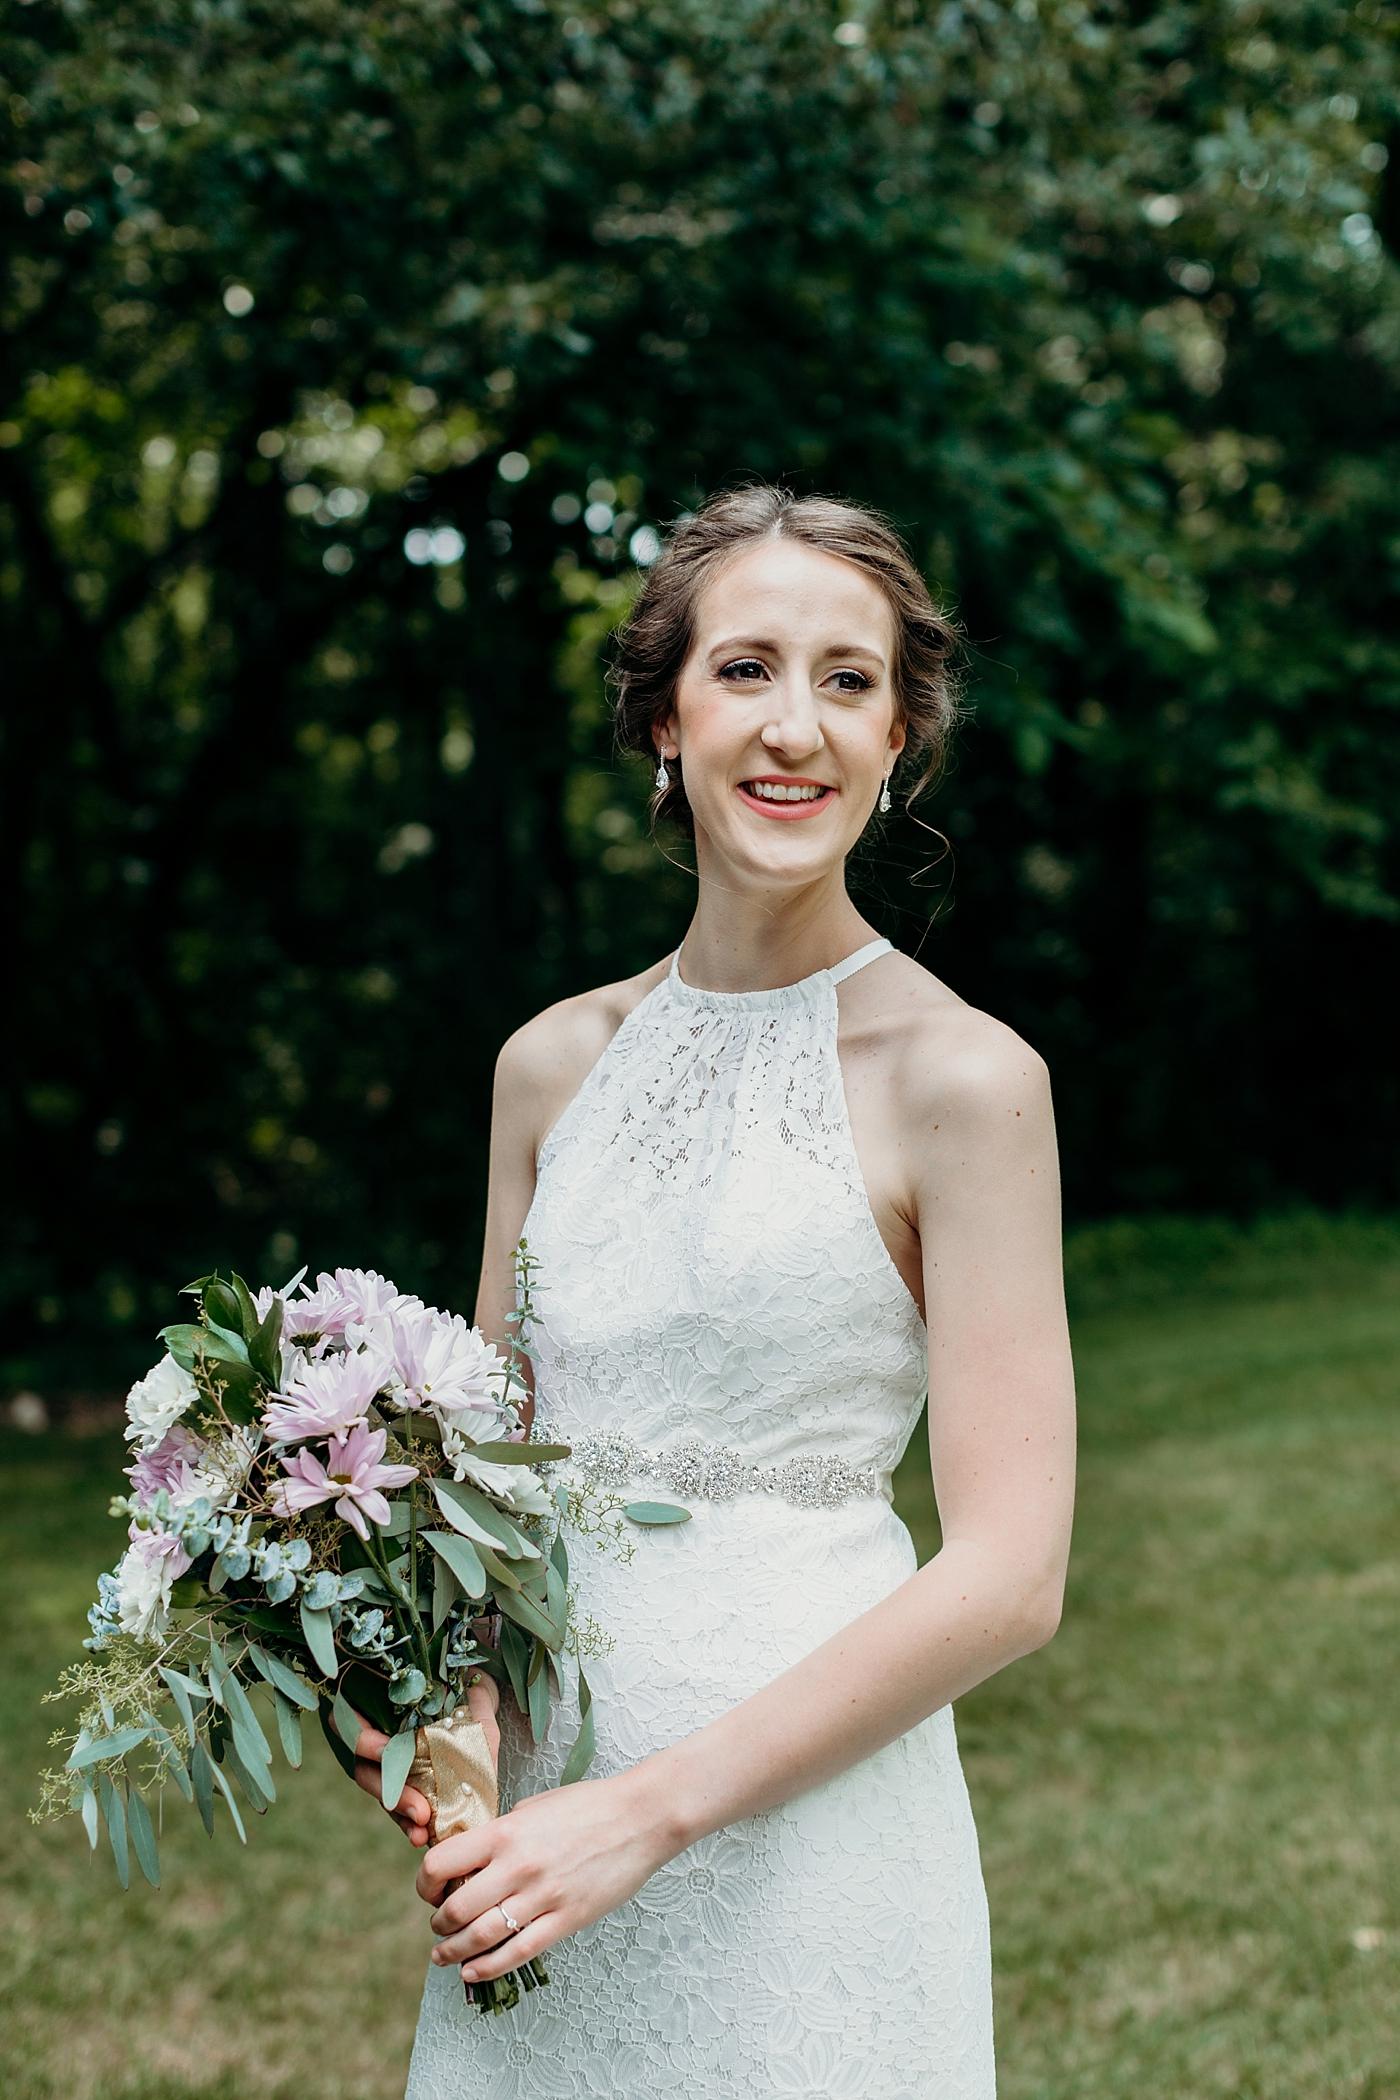 Chateau-Michelle-Wedding-Julia+JuanLuis_TheHeartlandersCo2018LA-24.jpg